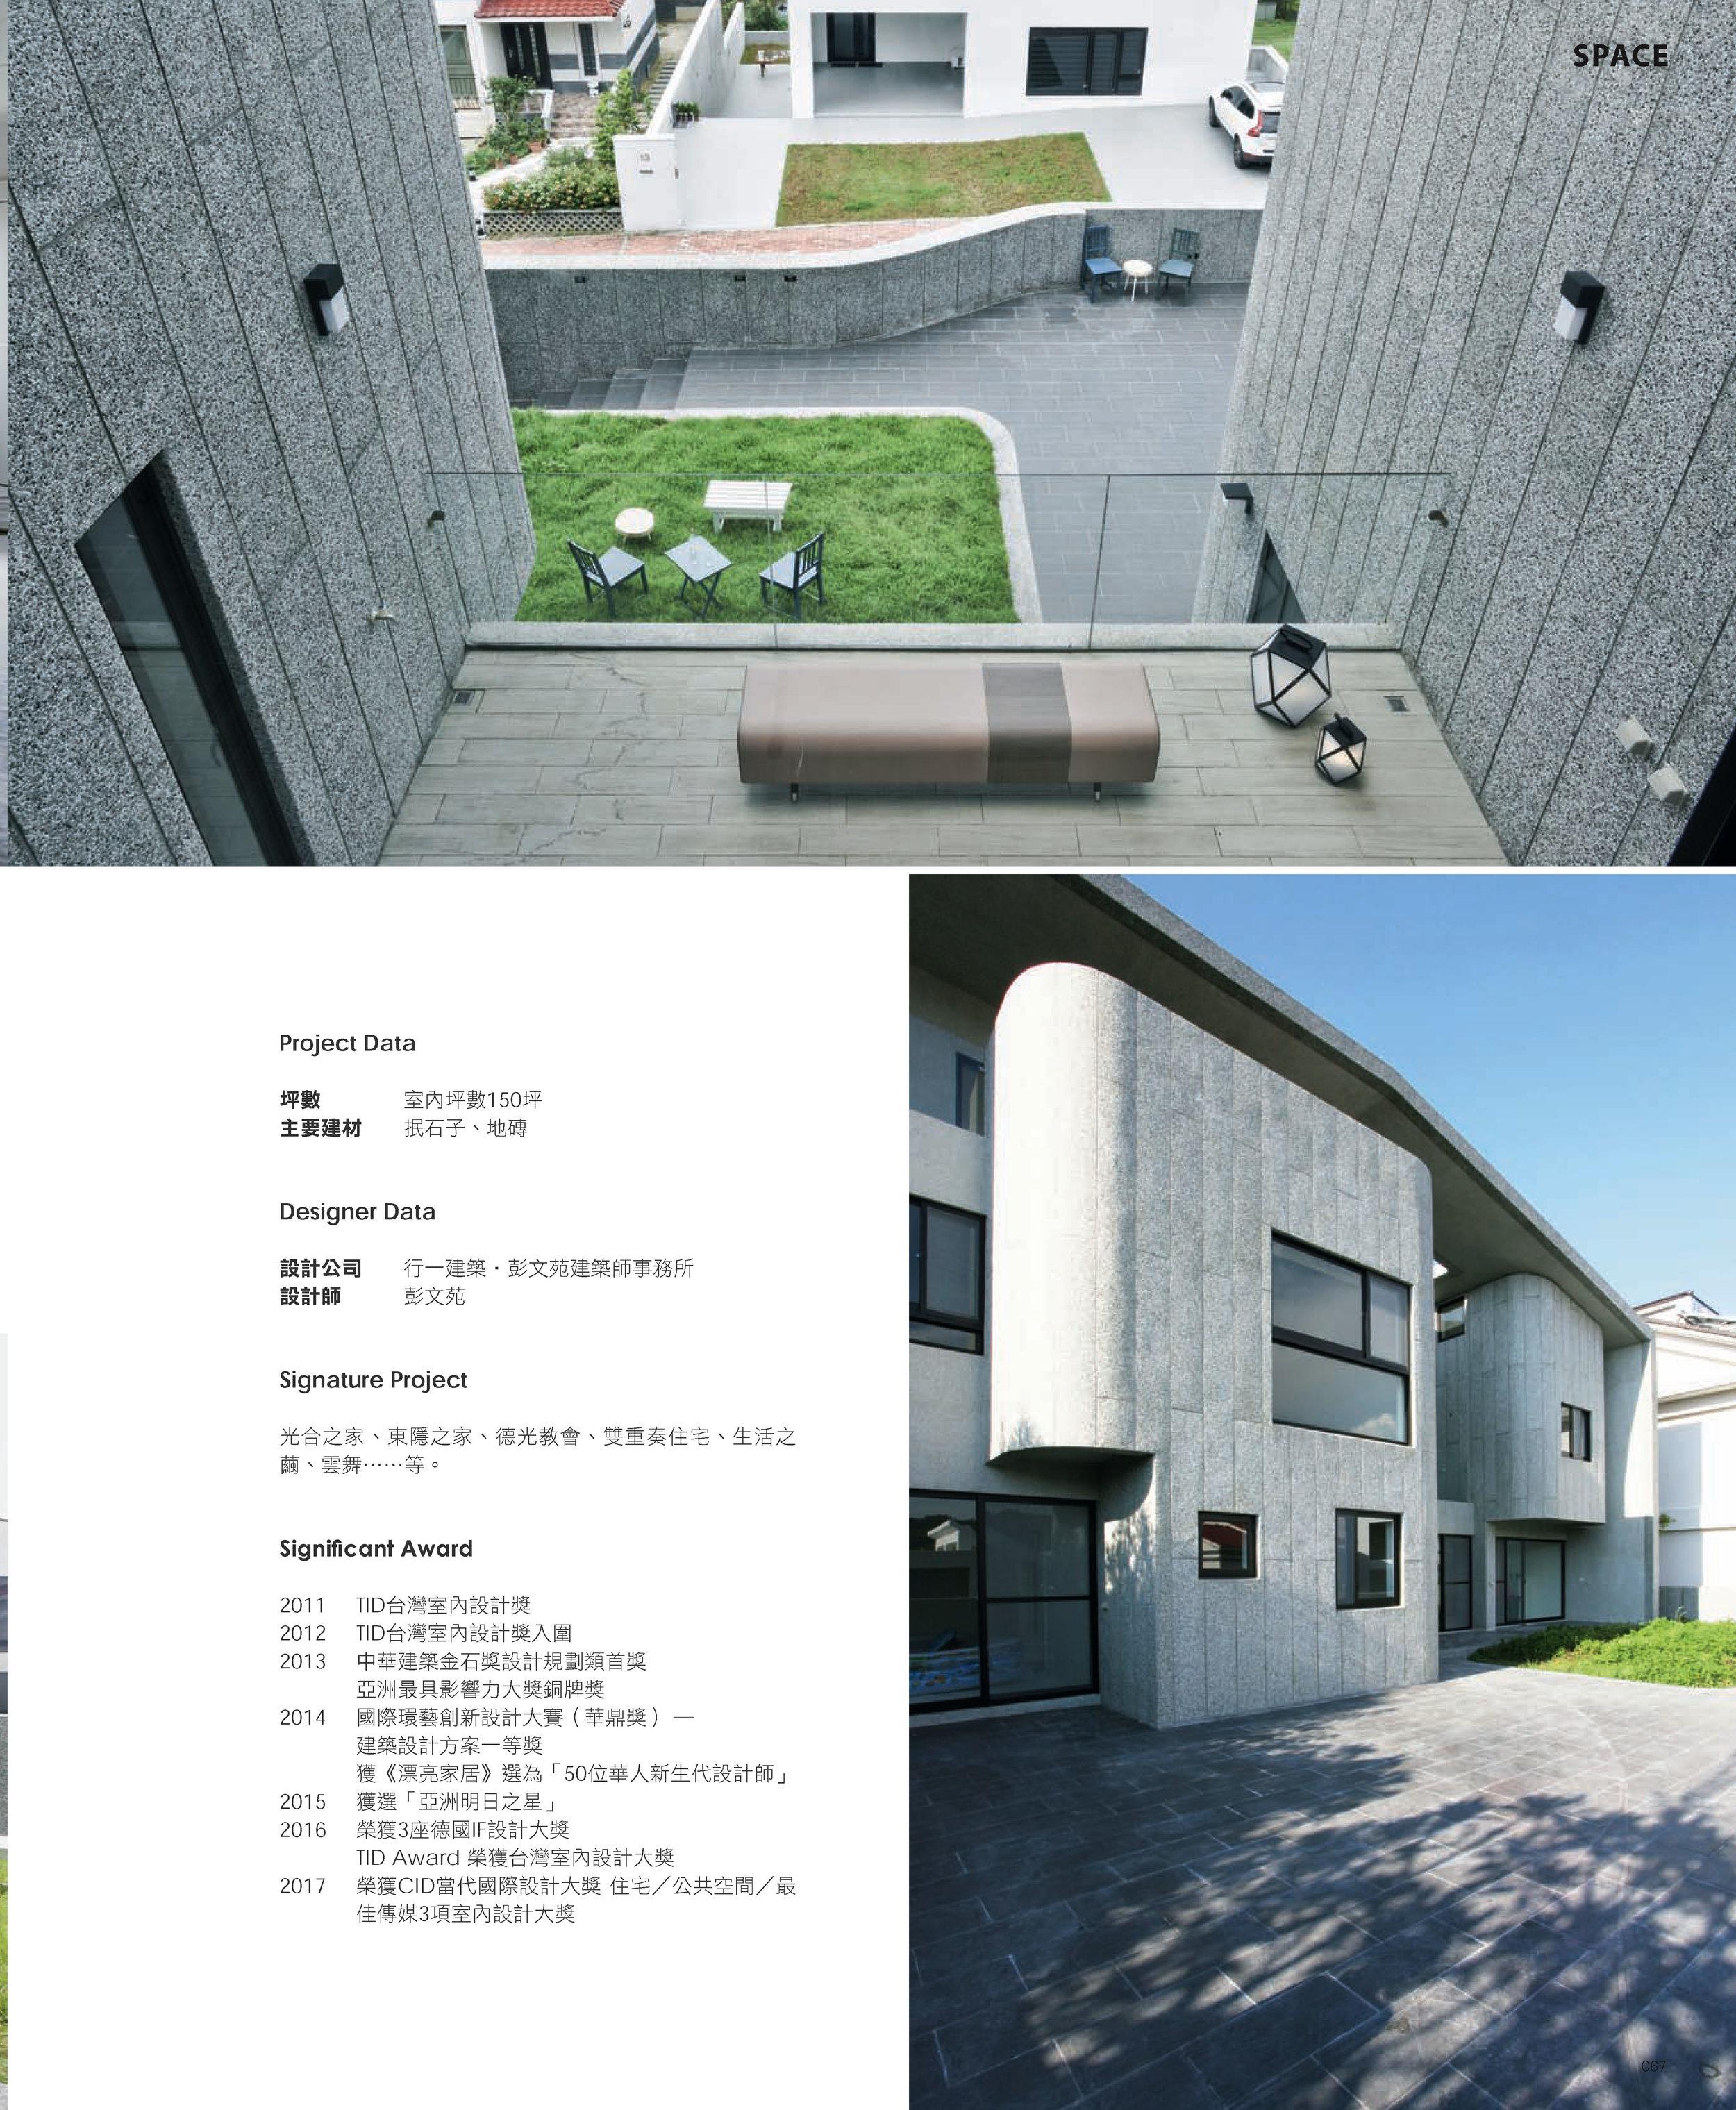 myhome201_SPACE_行一建築彭文苑建築師事務所_以空間動線、材質與自然做連結 揉合三代生活軌跡的光合之家_頁面_7.jpg